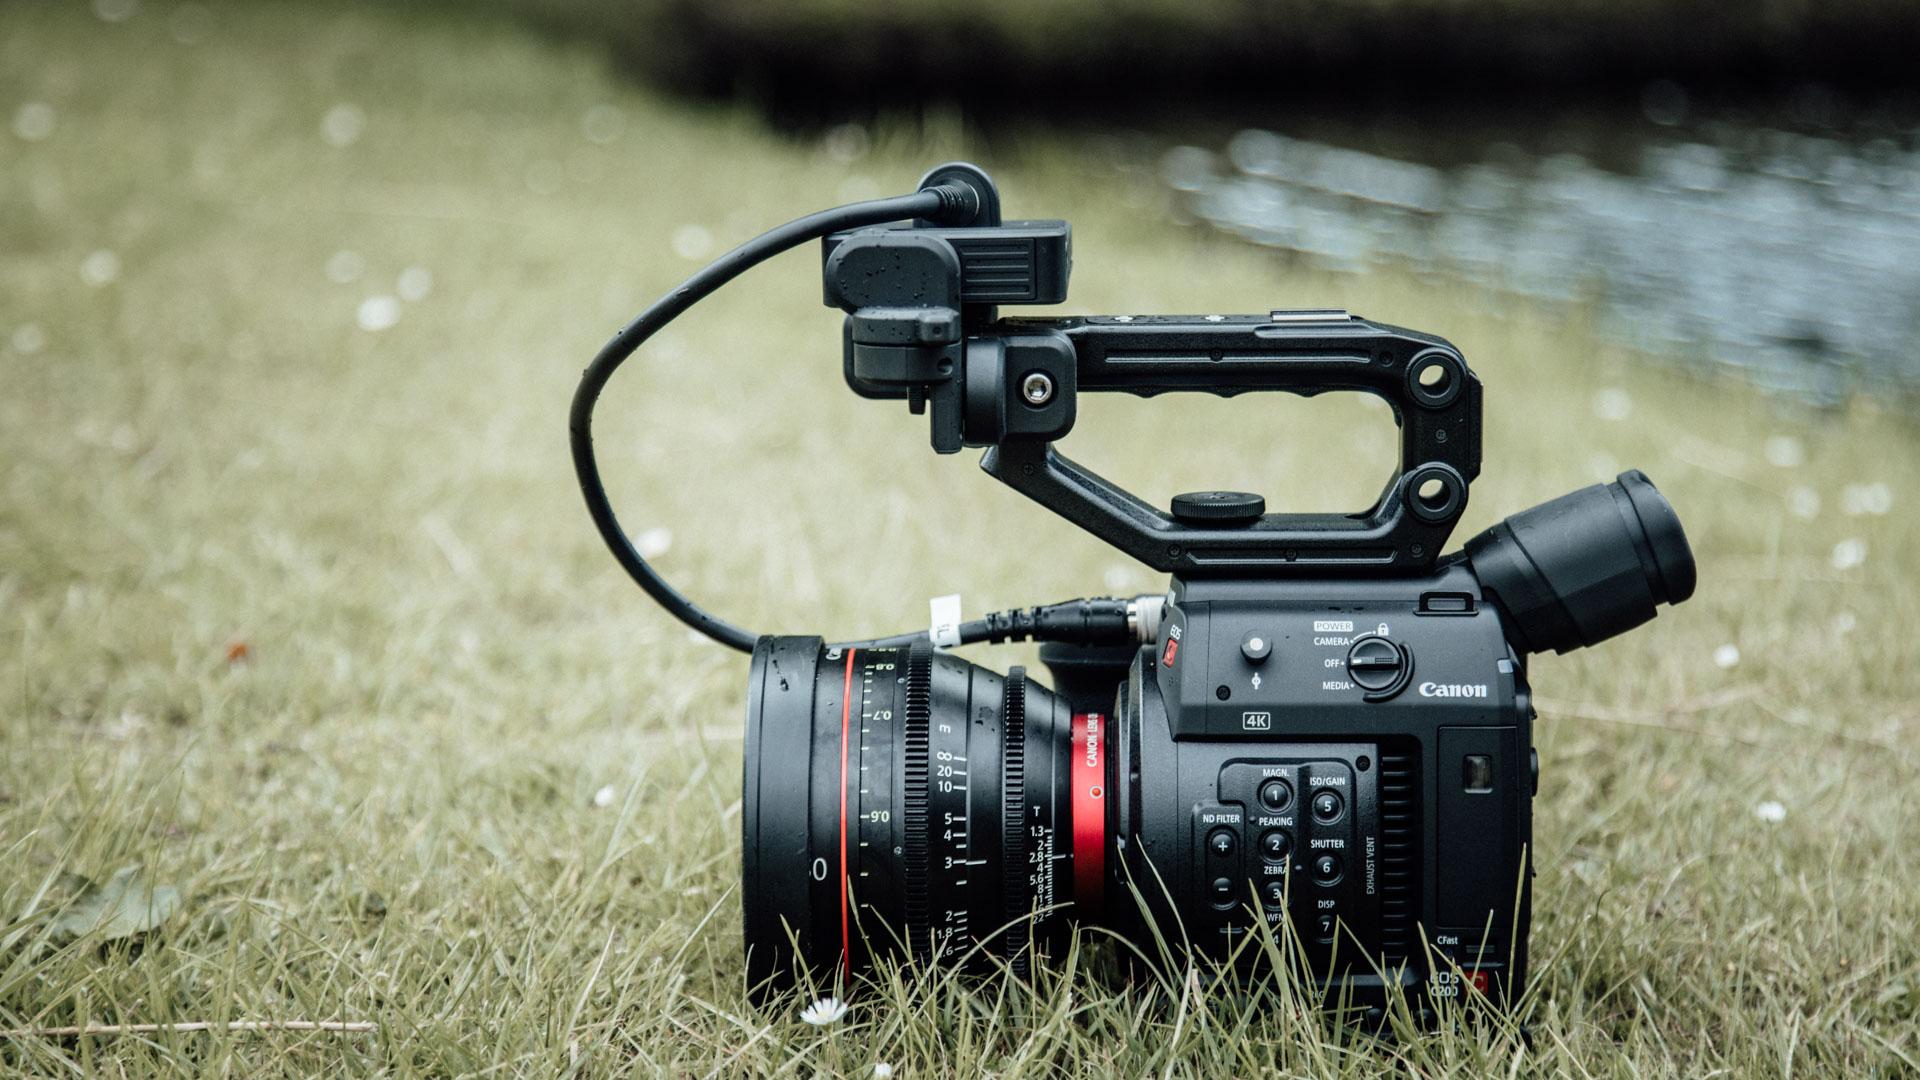 Canon C200 Review - Impressive RAW Footage & Ergonomics For